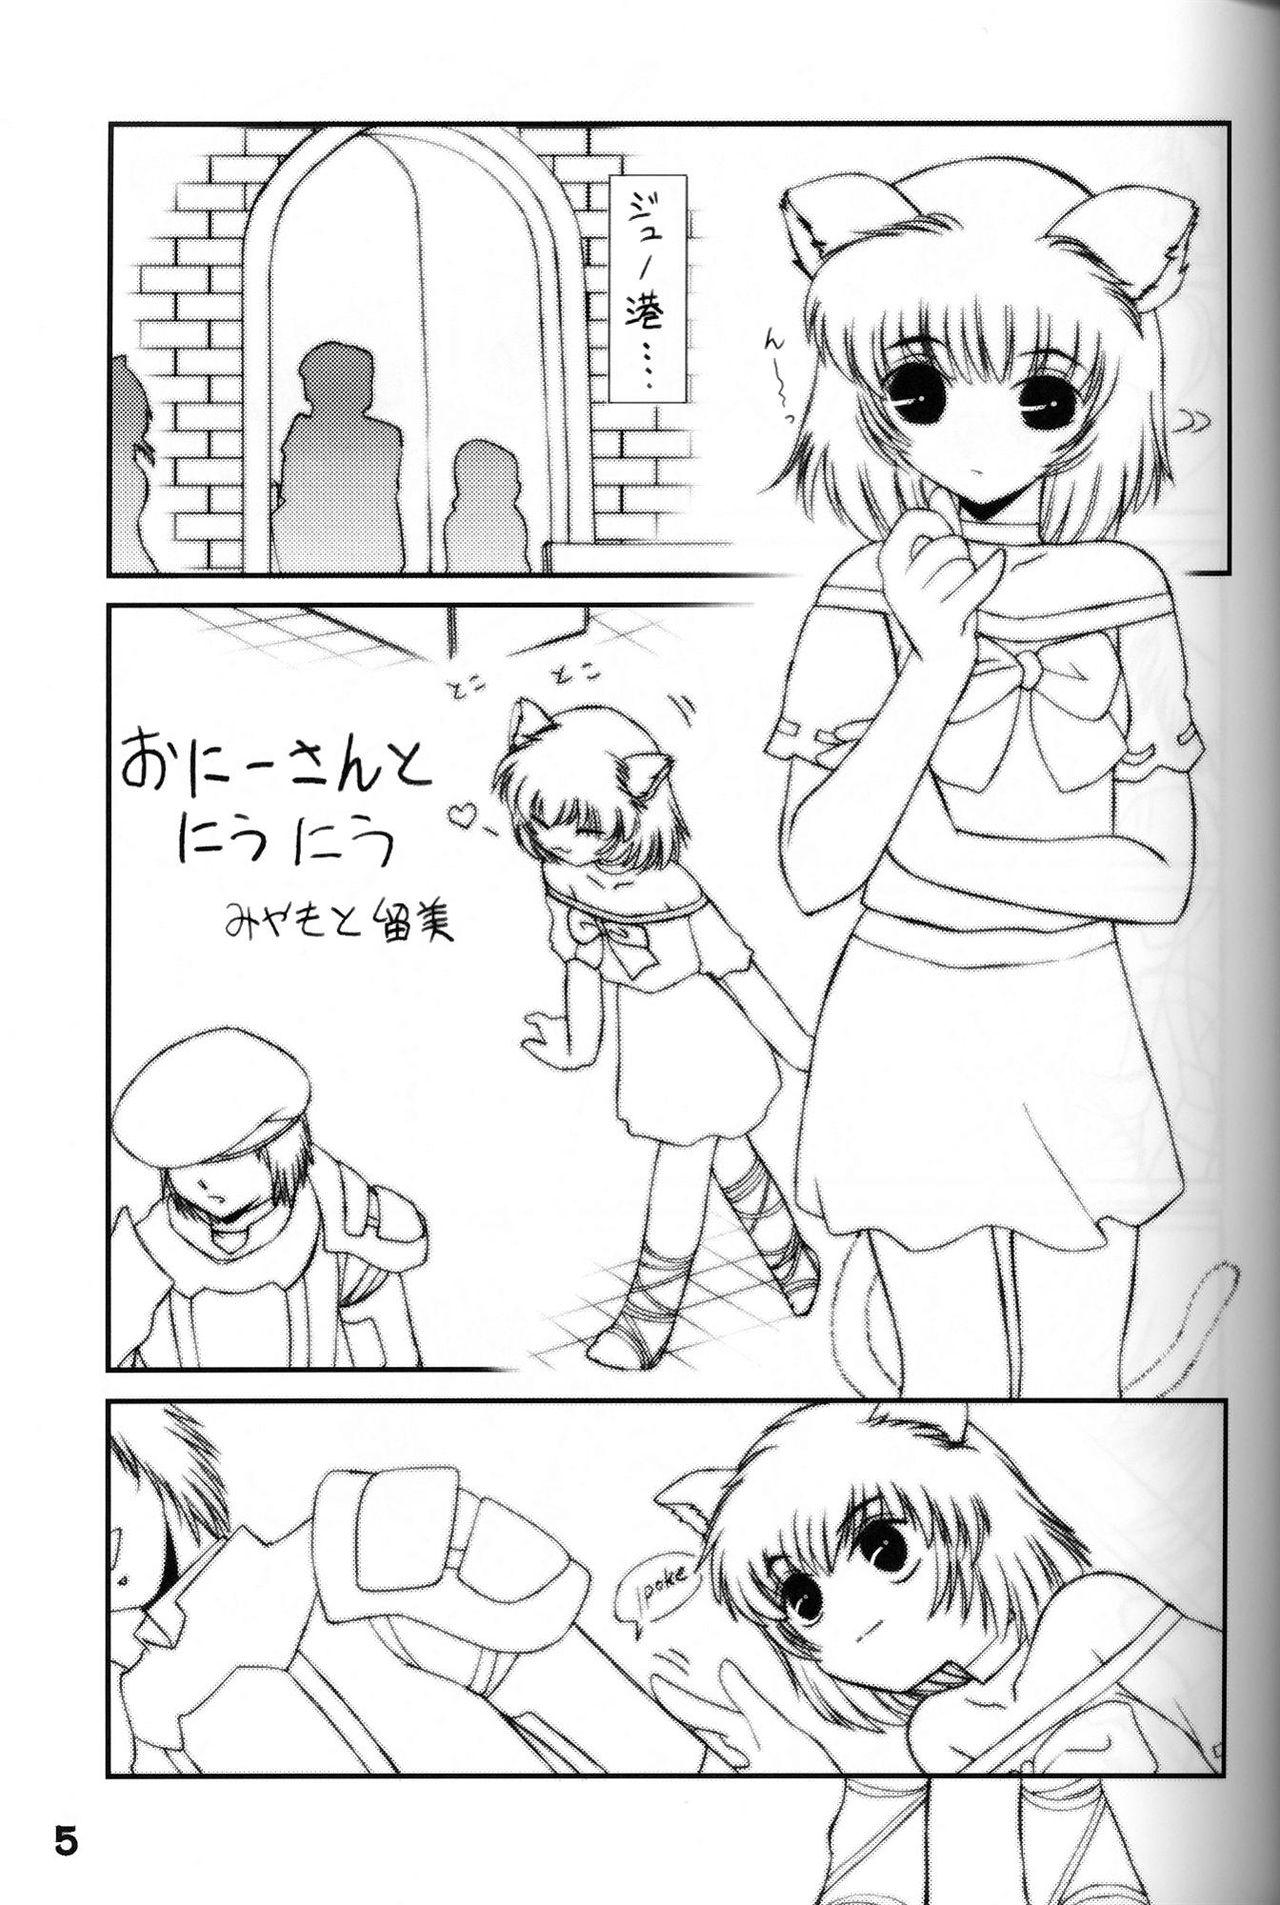 Shitteru Kuse ni! Vol. 33 3